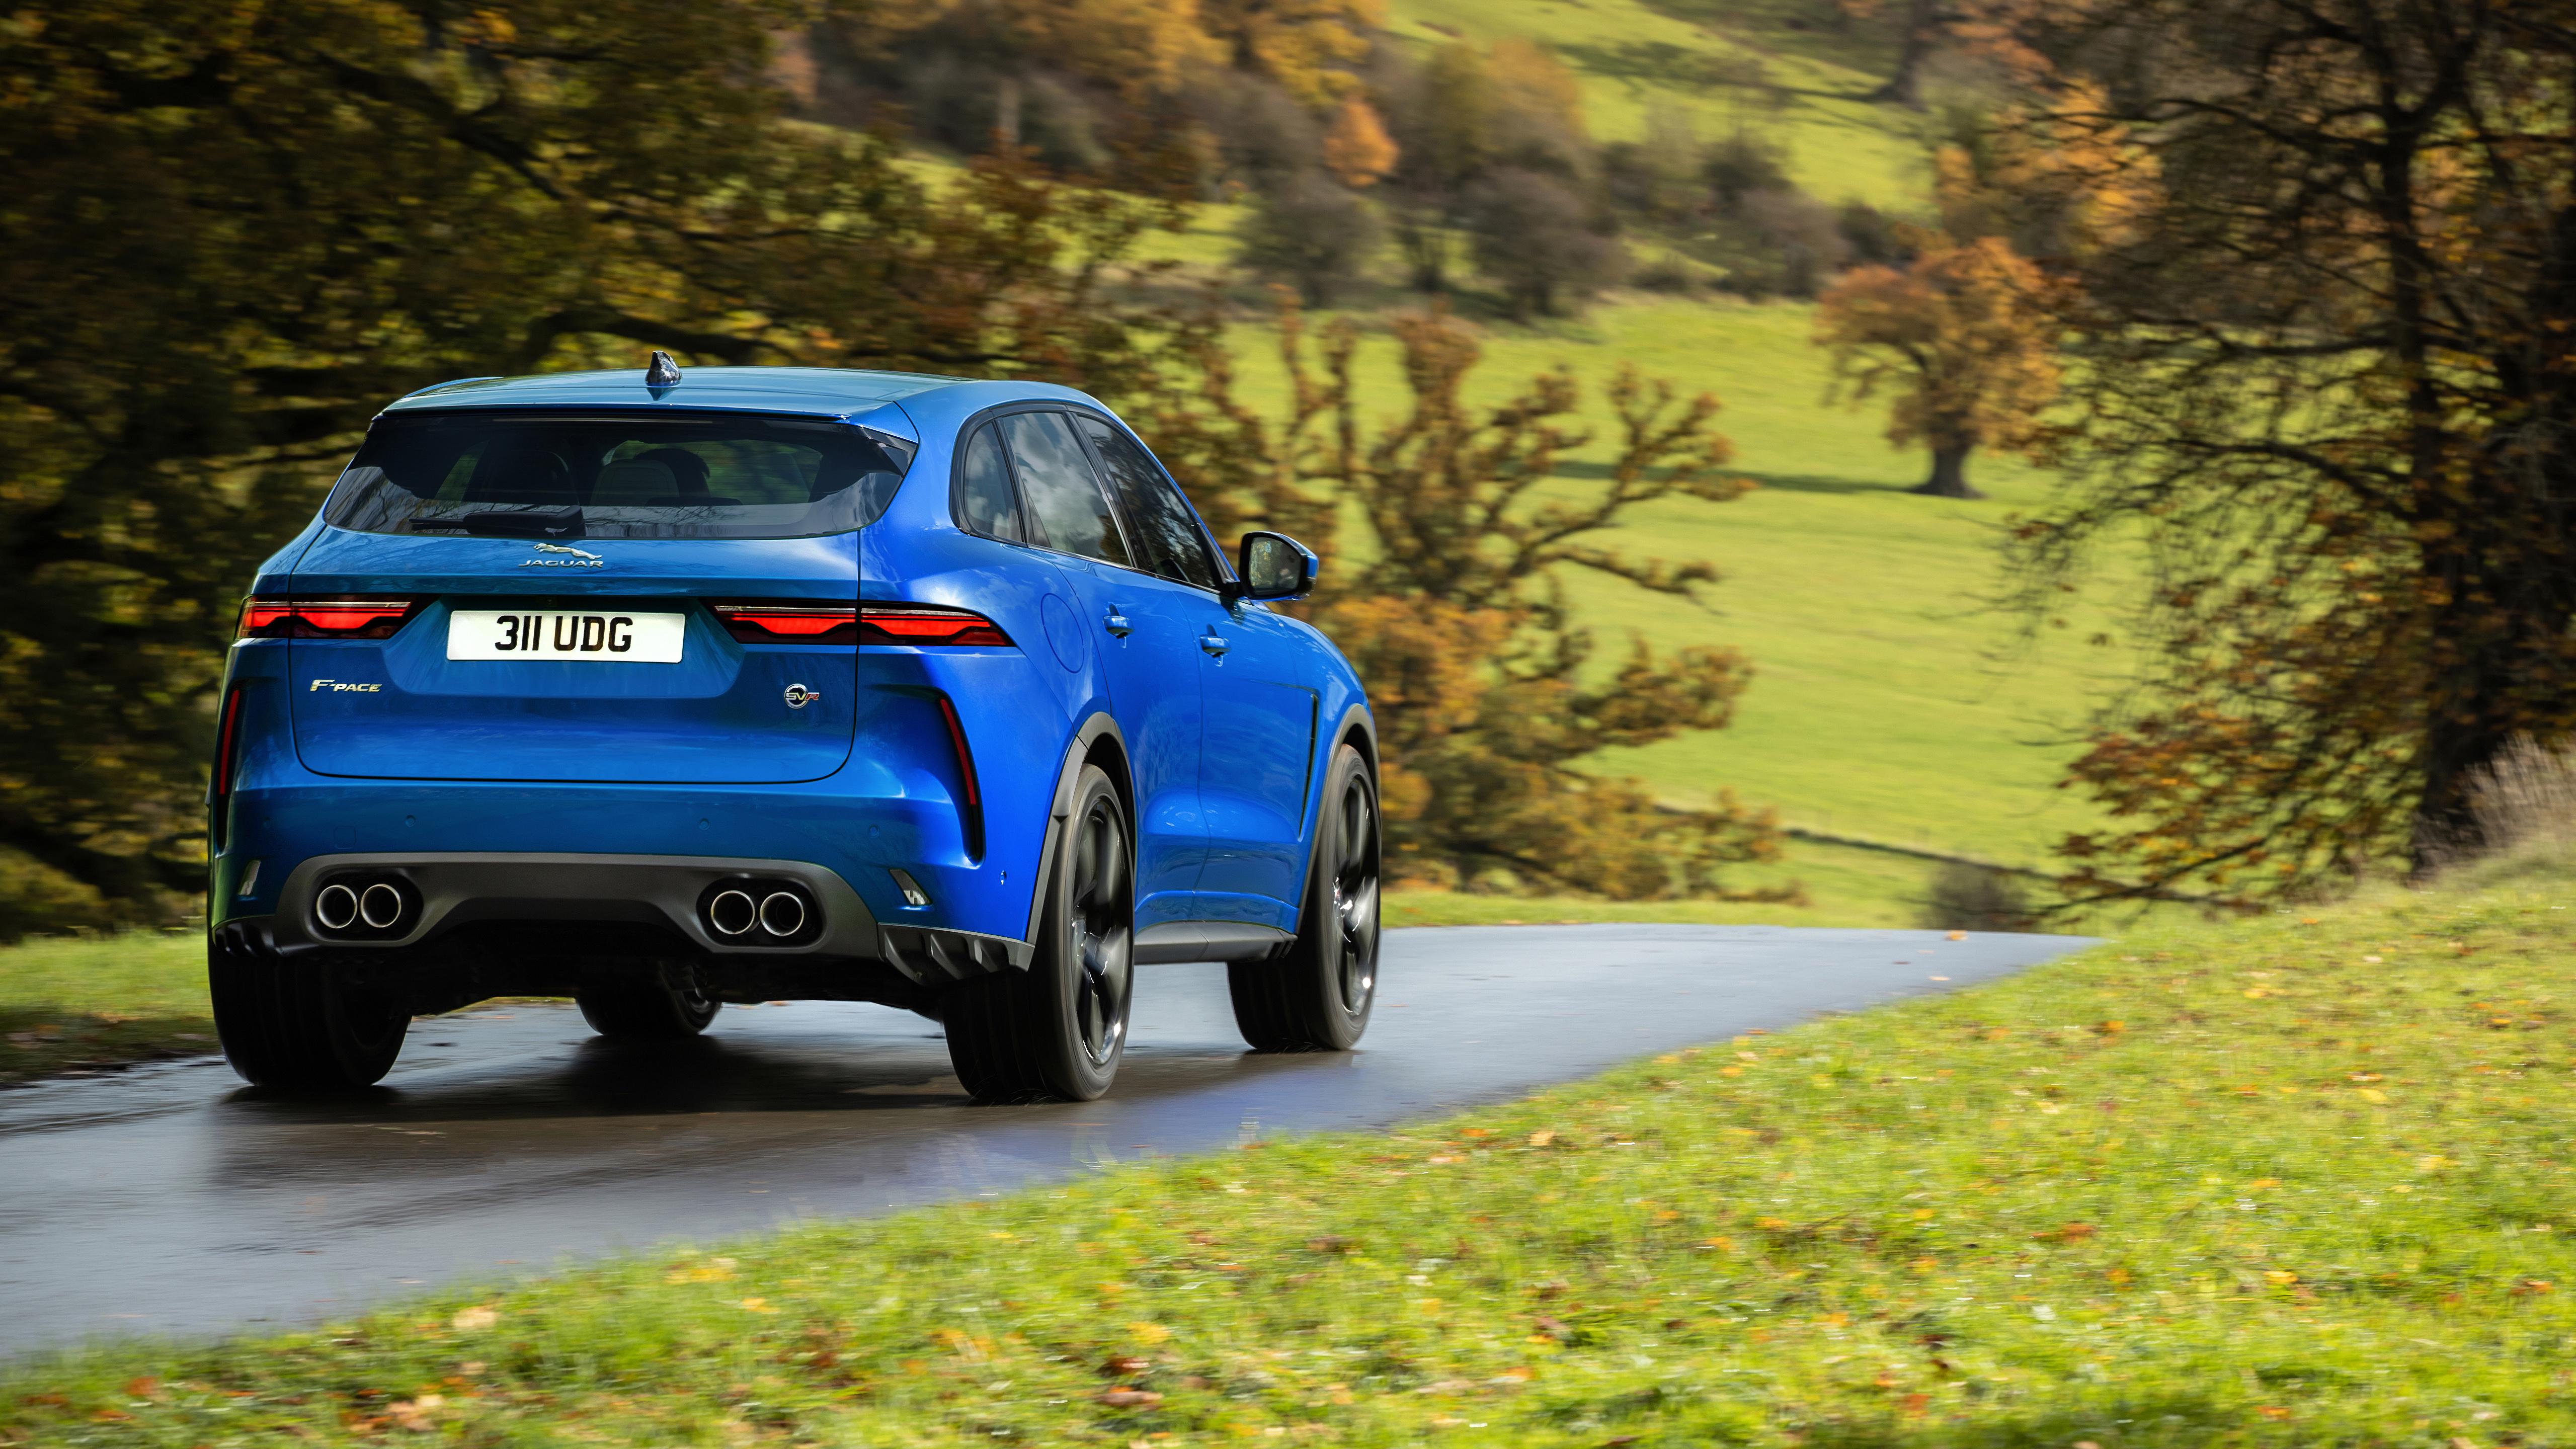 Jaguar F Pace Svr 2021 5k 2 Wallpaper Hd Car Wallpapers Id 16673